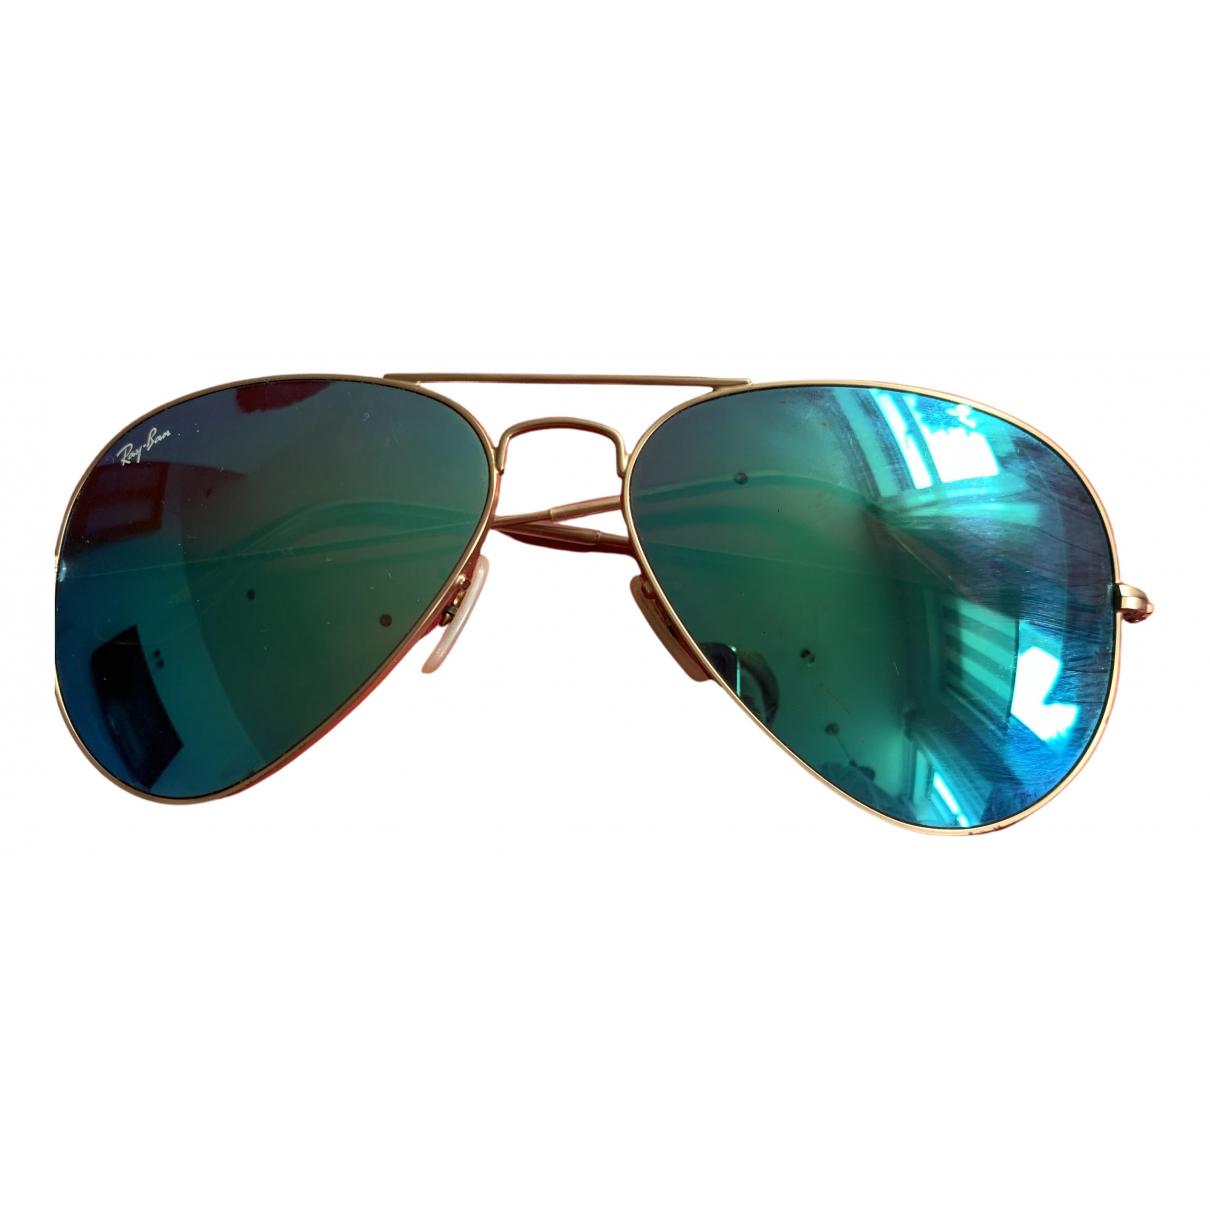 Ray-ban Aviator Sonnenbrillen in  Blau Metall